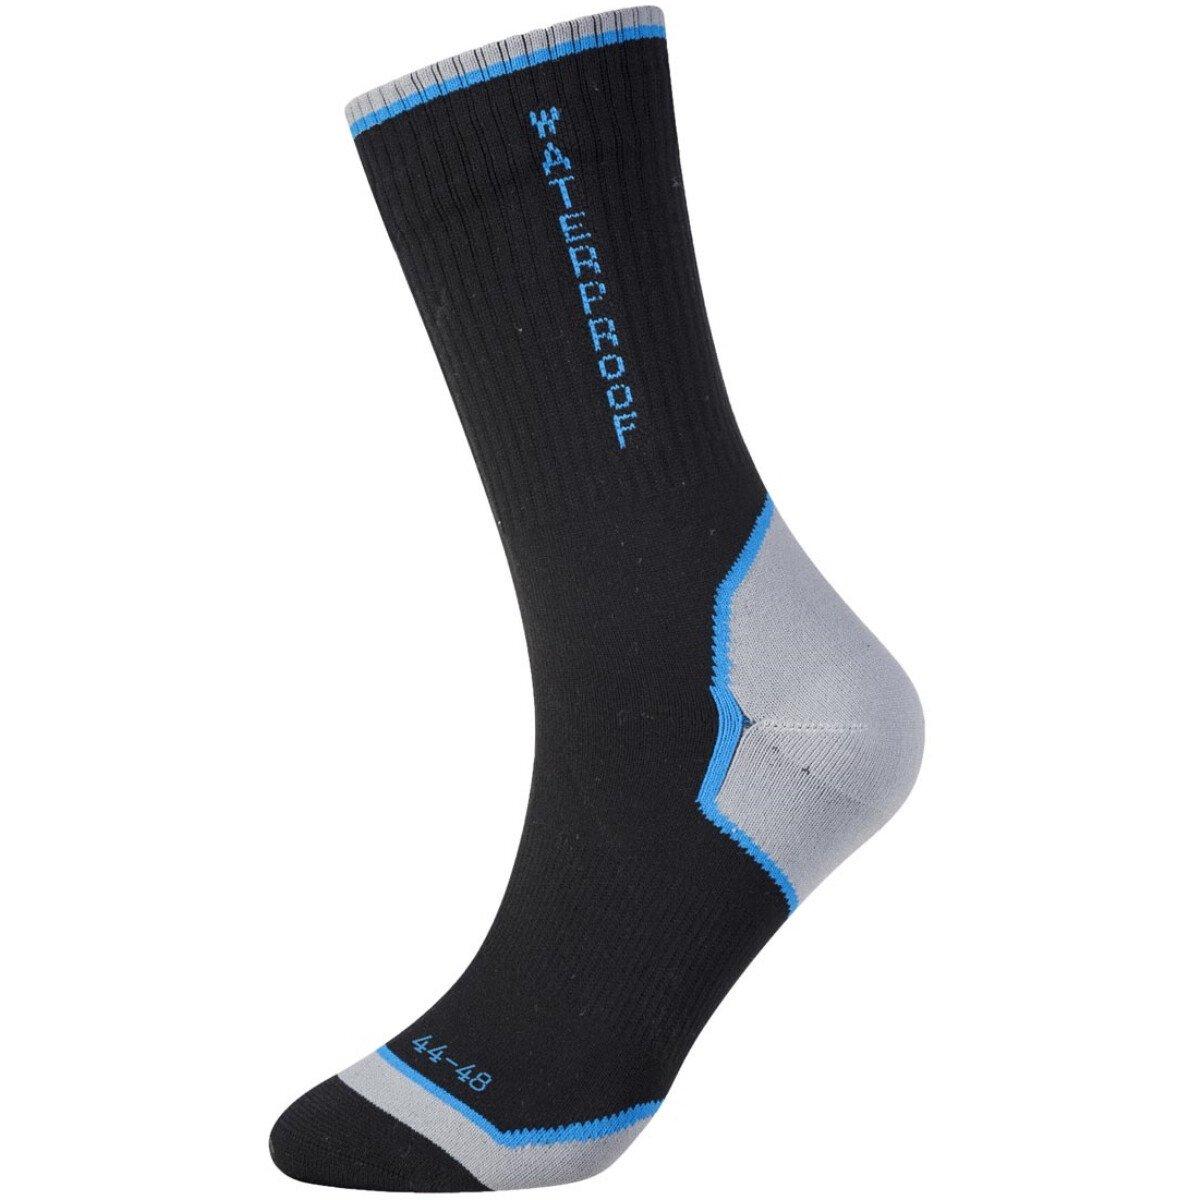 Portwest SK23 Black Size 6 - Size 9 (EU39 - EU43) Performance Waterproof Socks